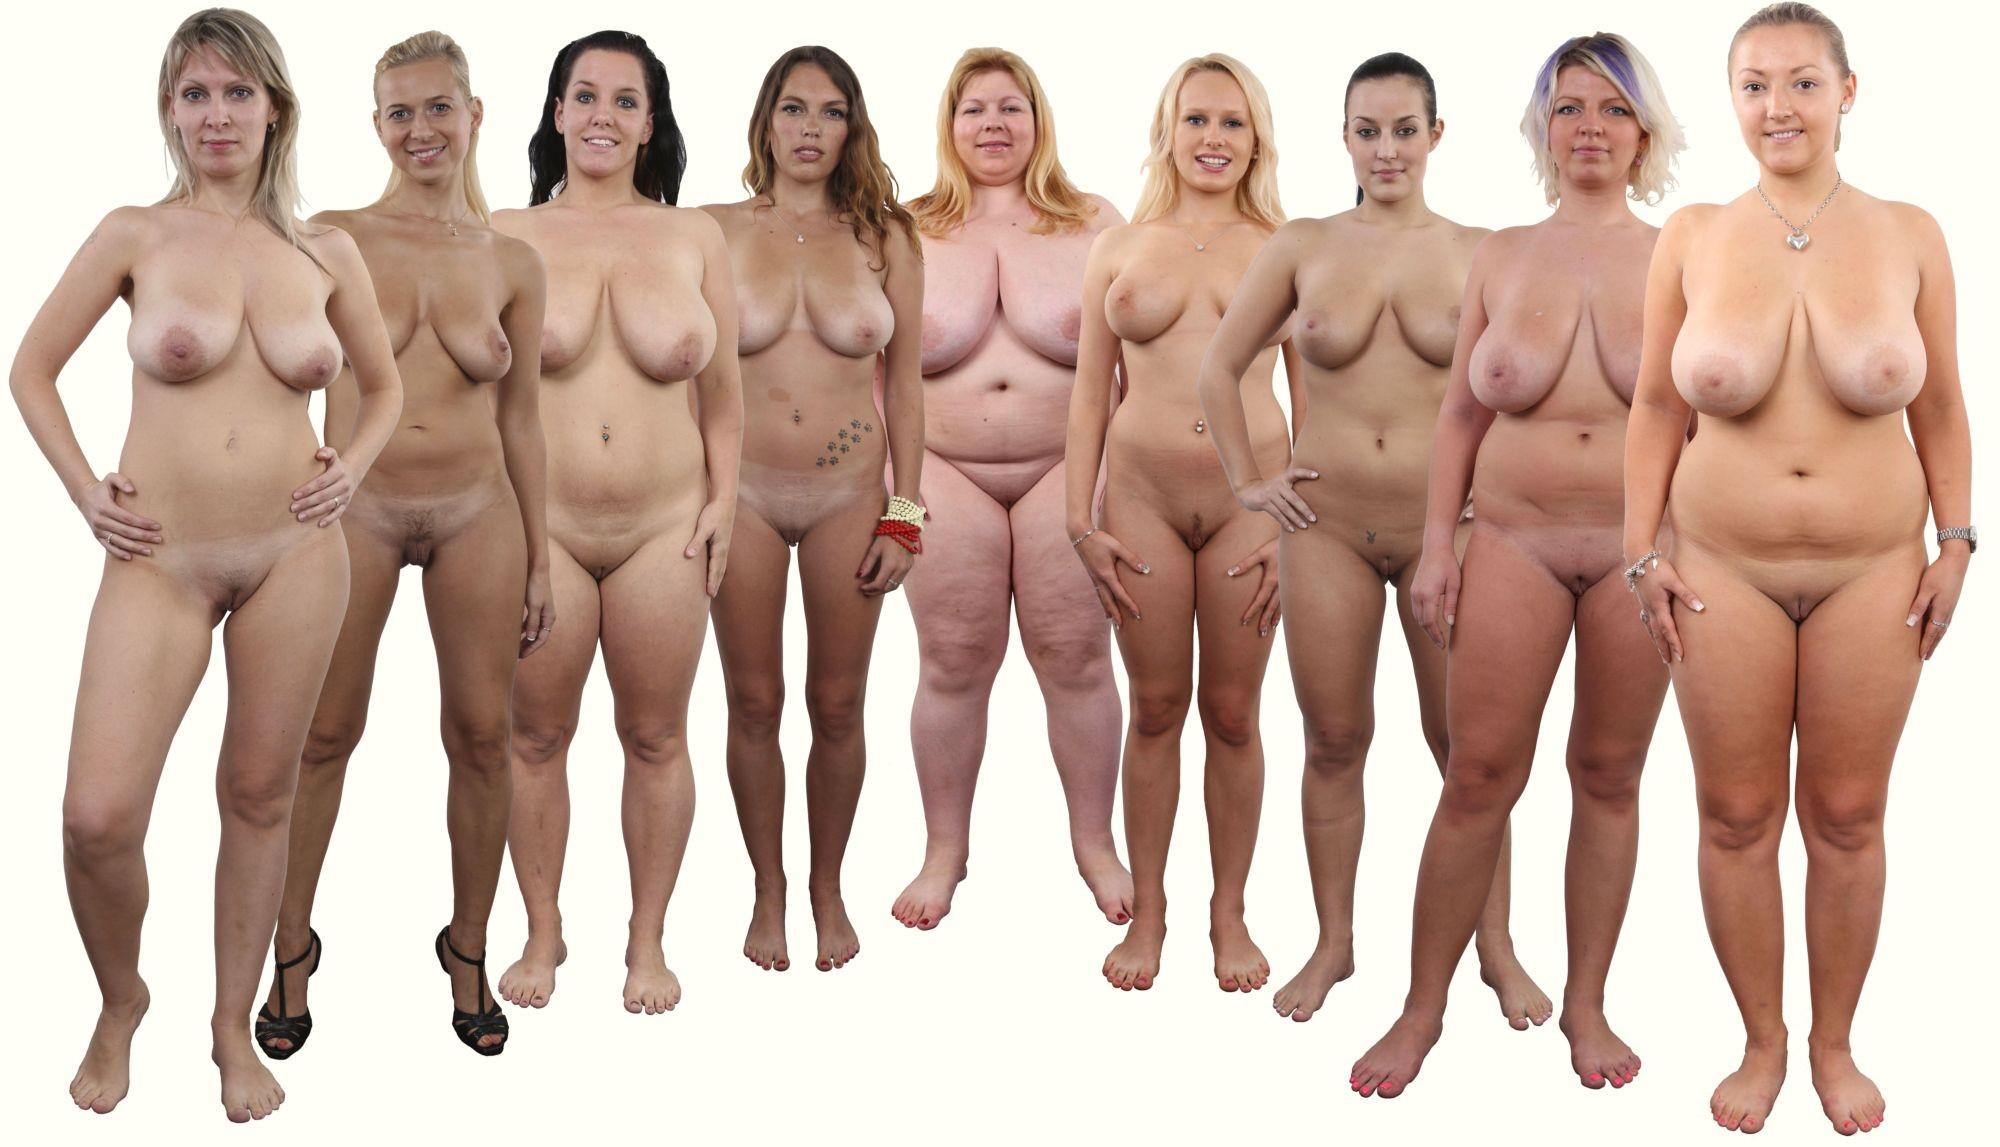 Кастинг Обнаженных Женщин